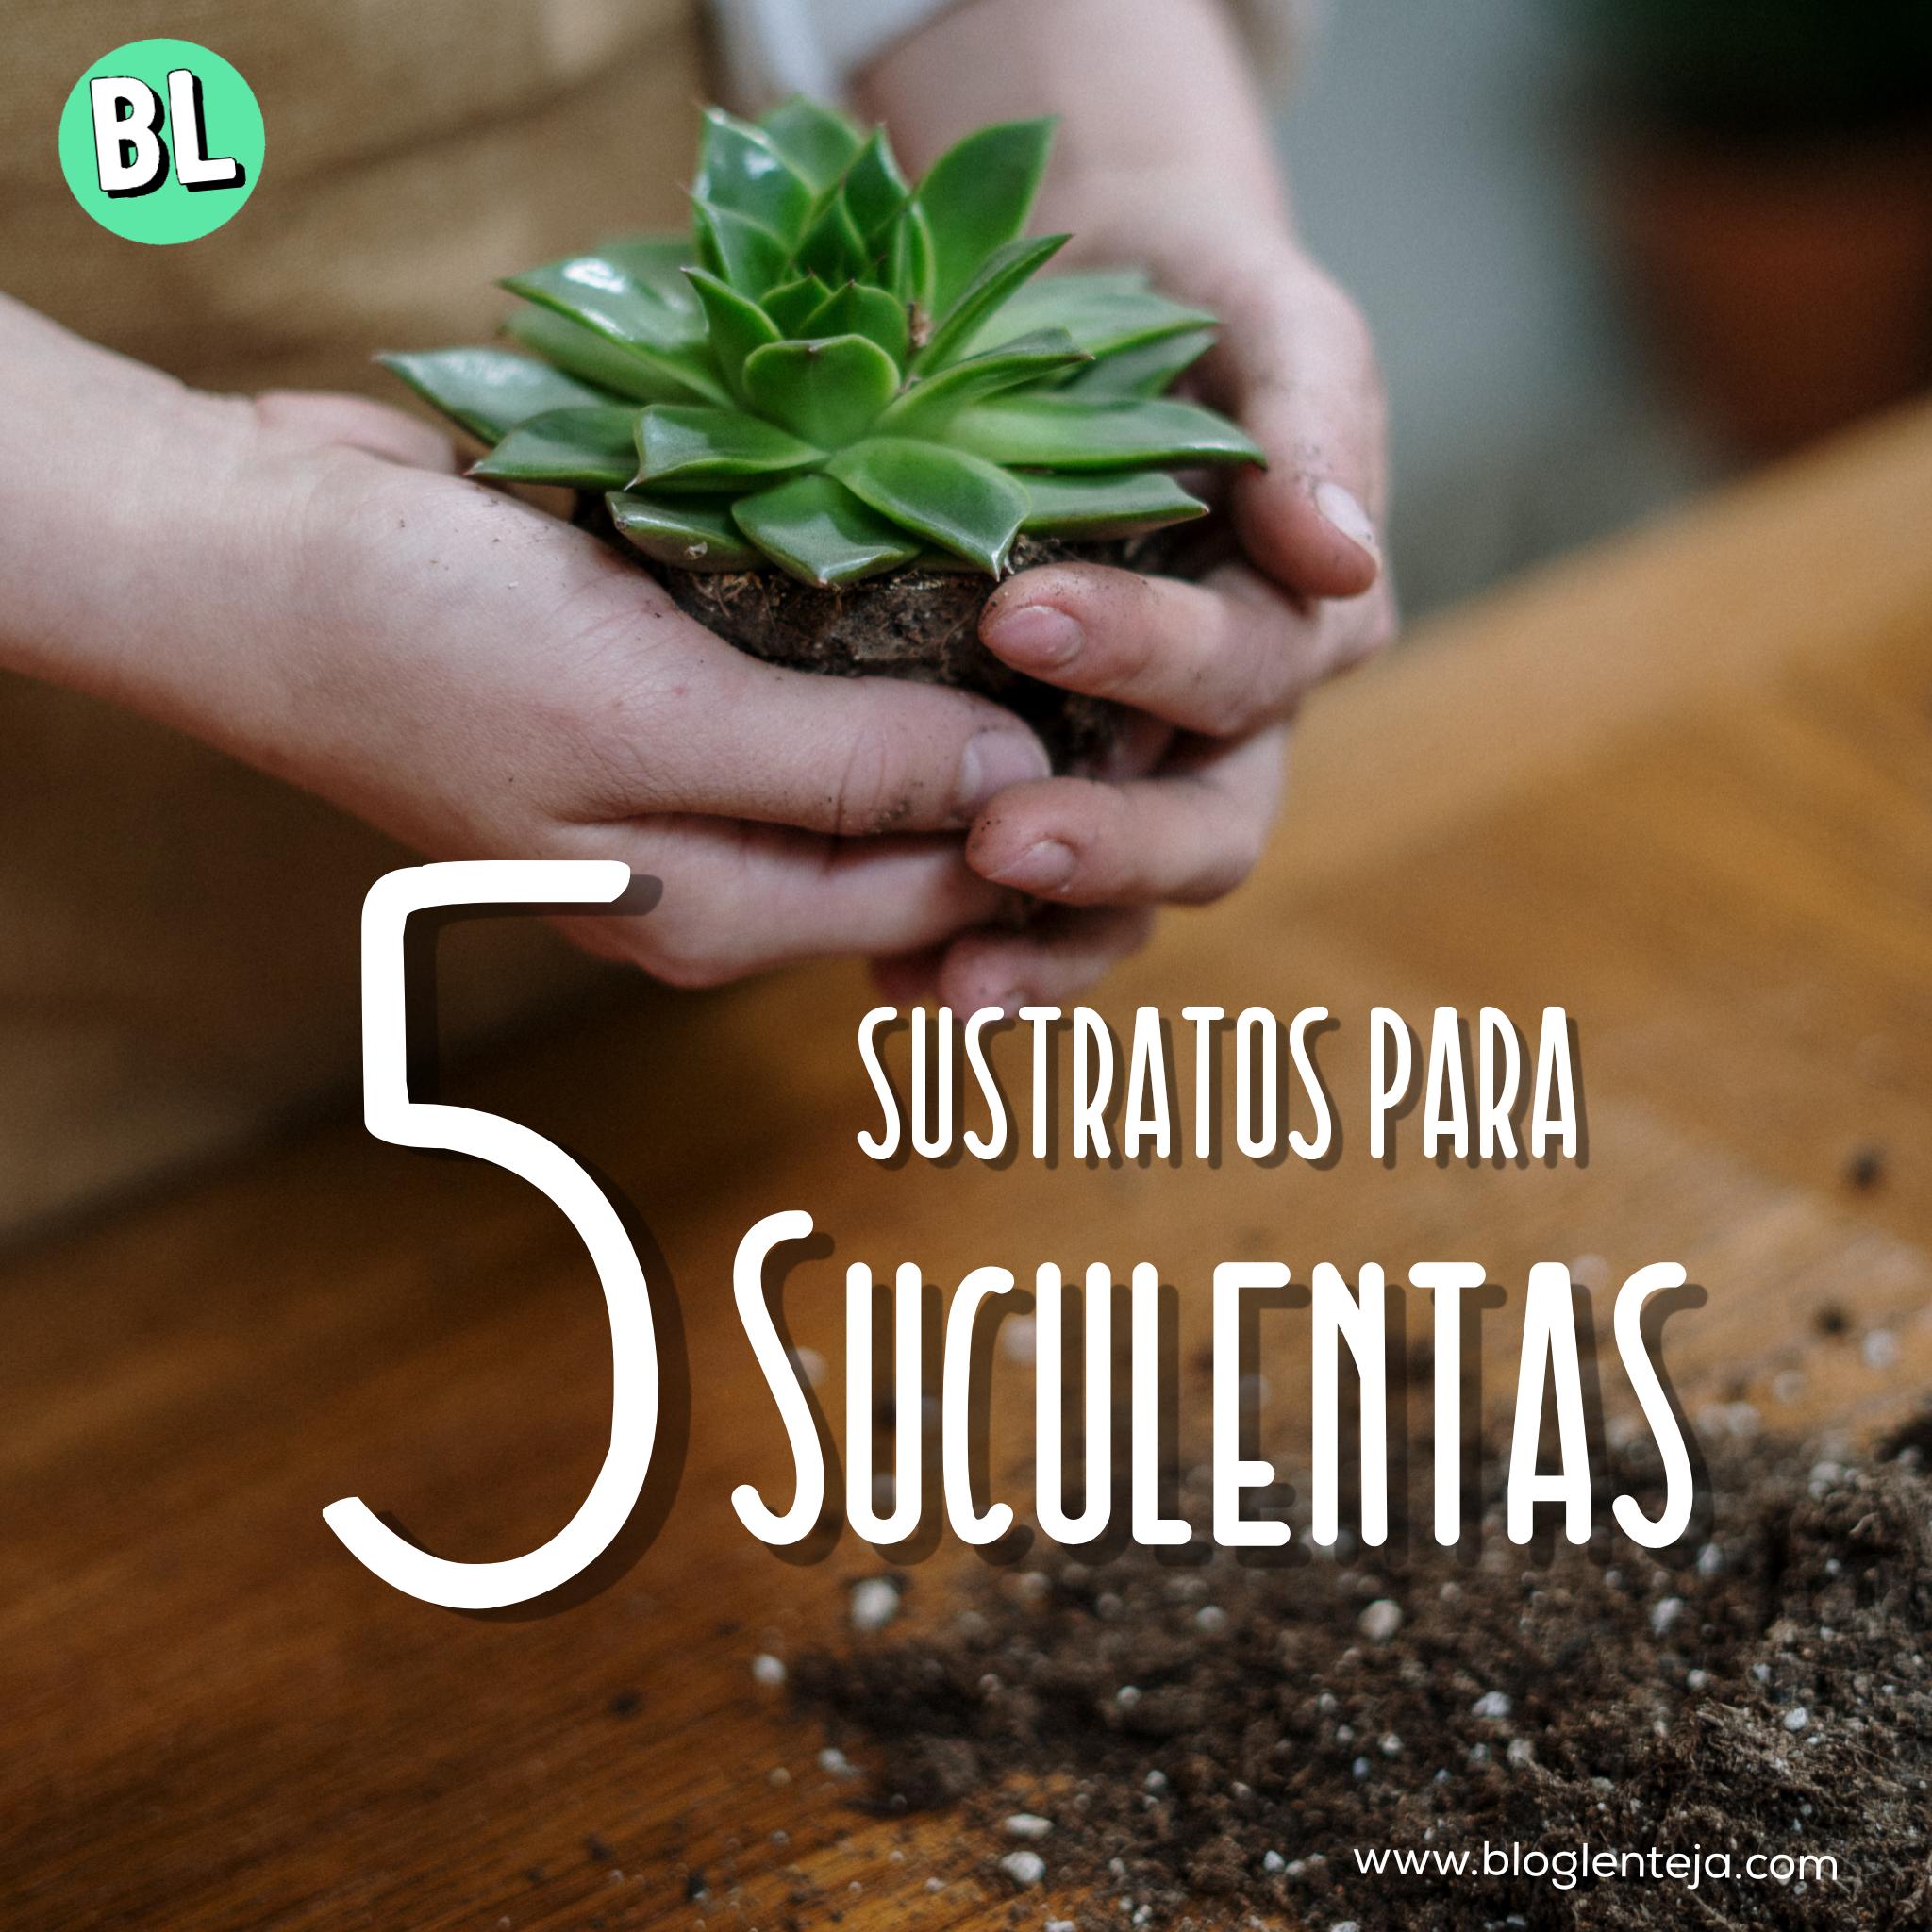 5 sustratos para Suculentas